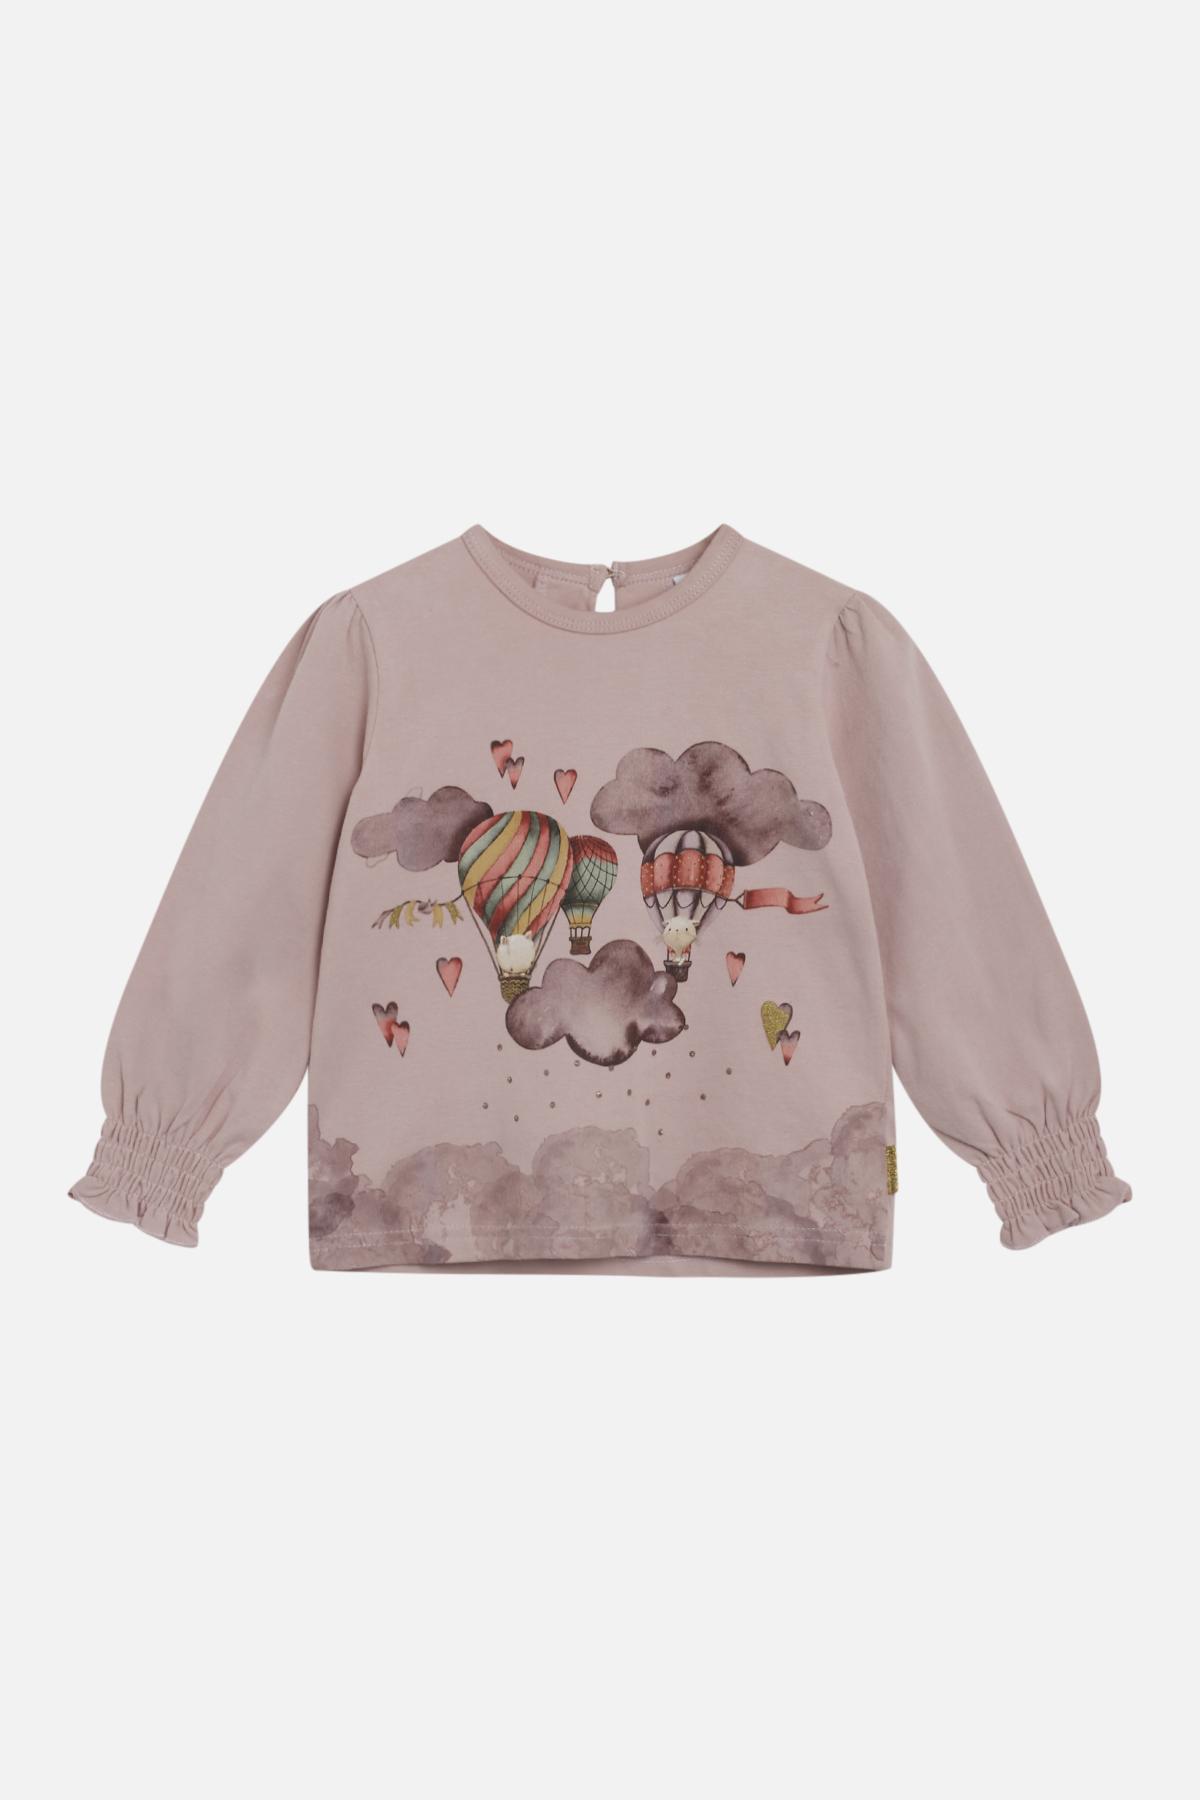 Hust & Claire Adelena T-shirt, Dusty Rose, 3 år